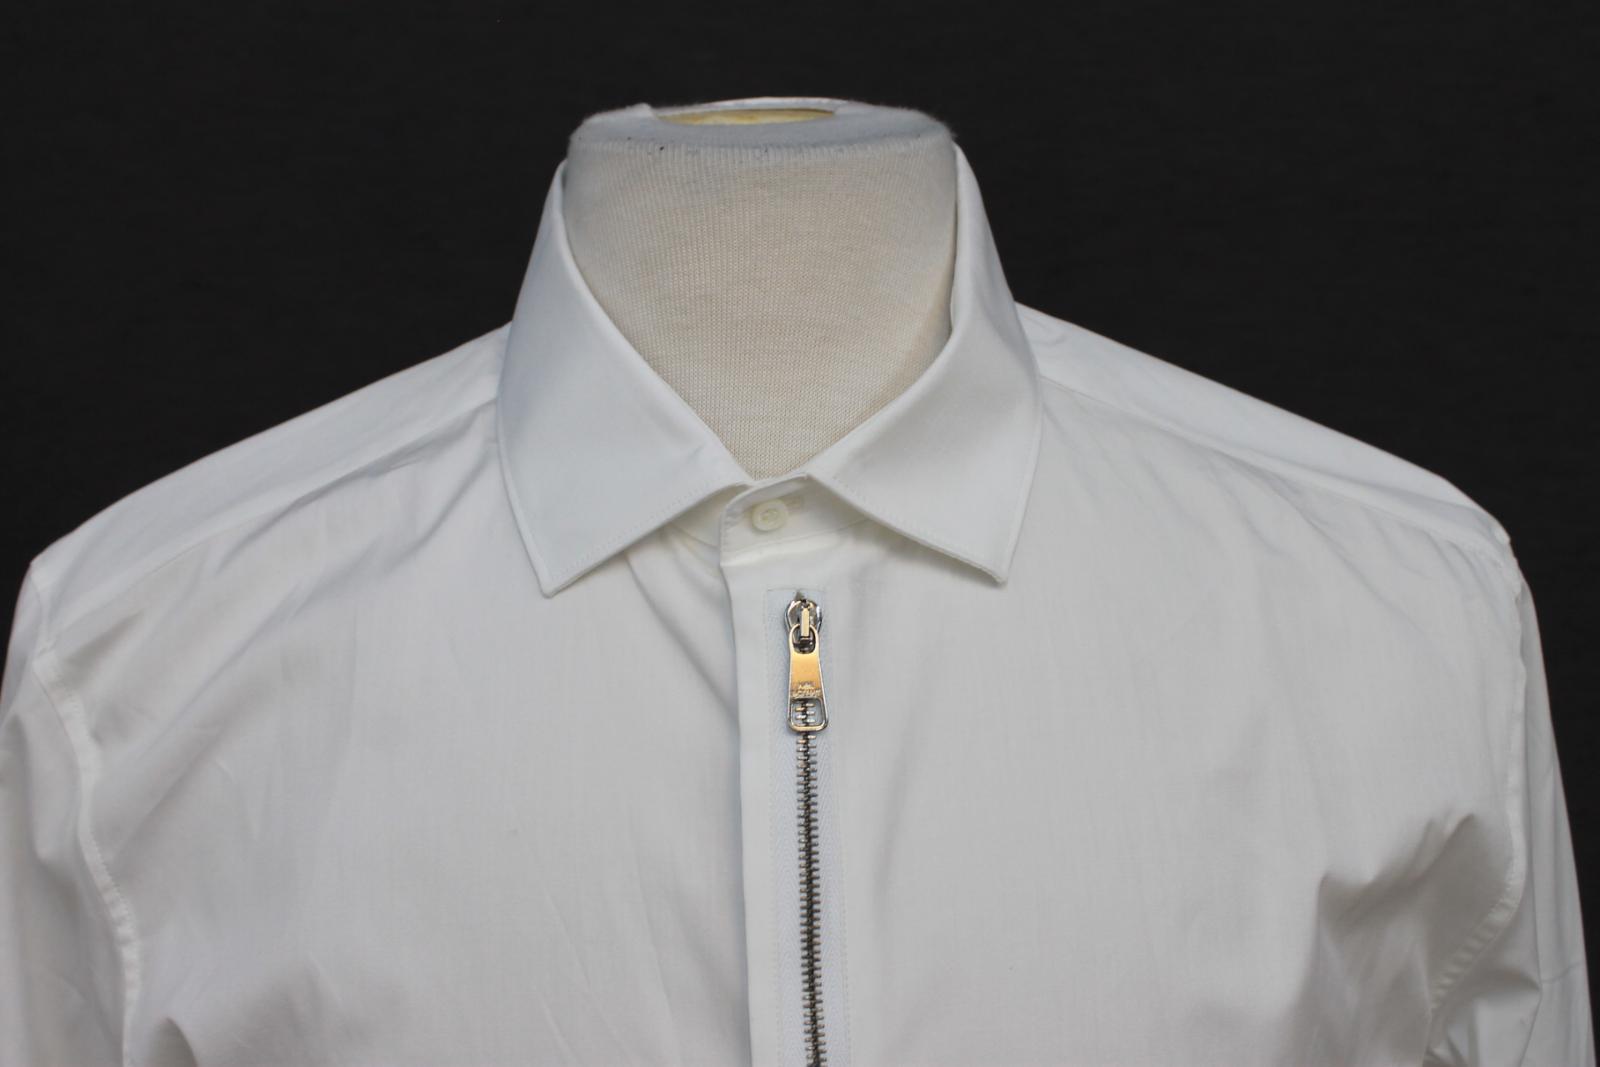 Neil-Barrett-para-hombre-calce-cenido-de-algodon-blanco-frontal-con-cremallera-con-cuello-camisa miniatura 3